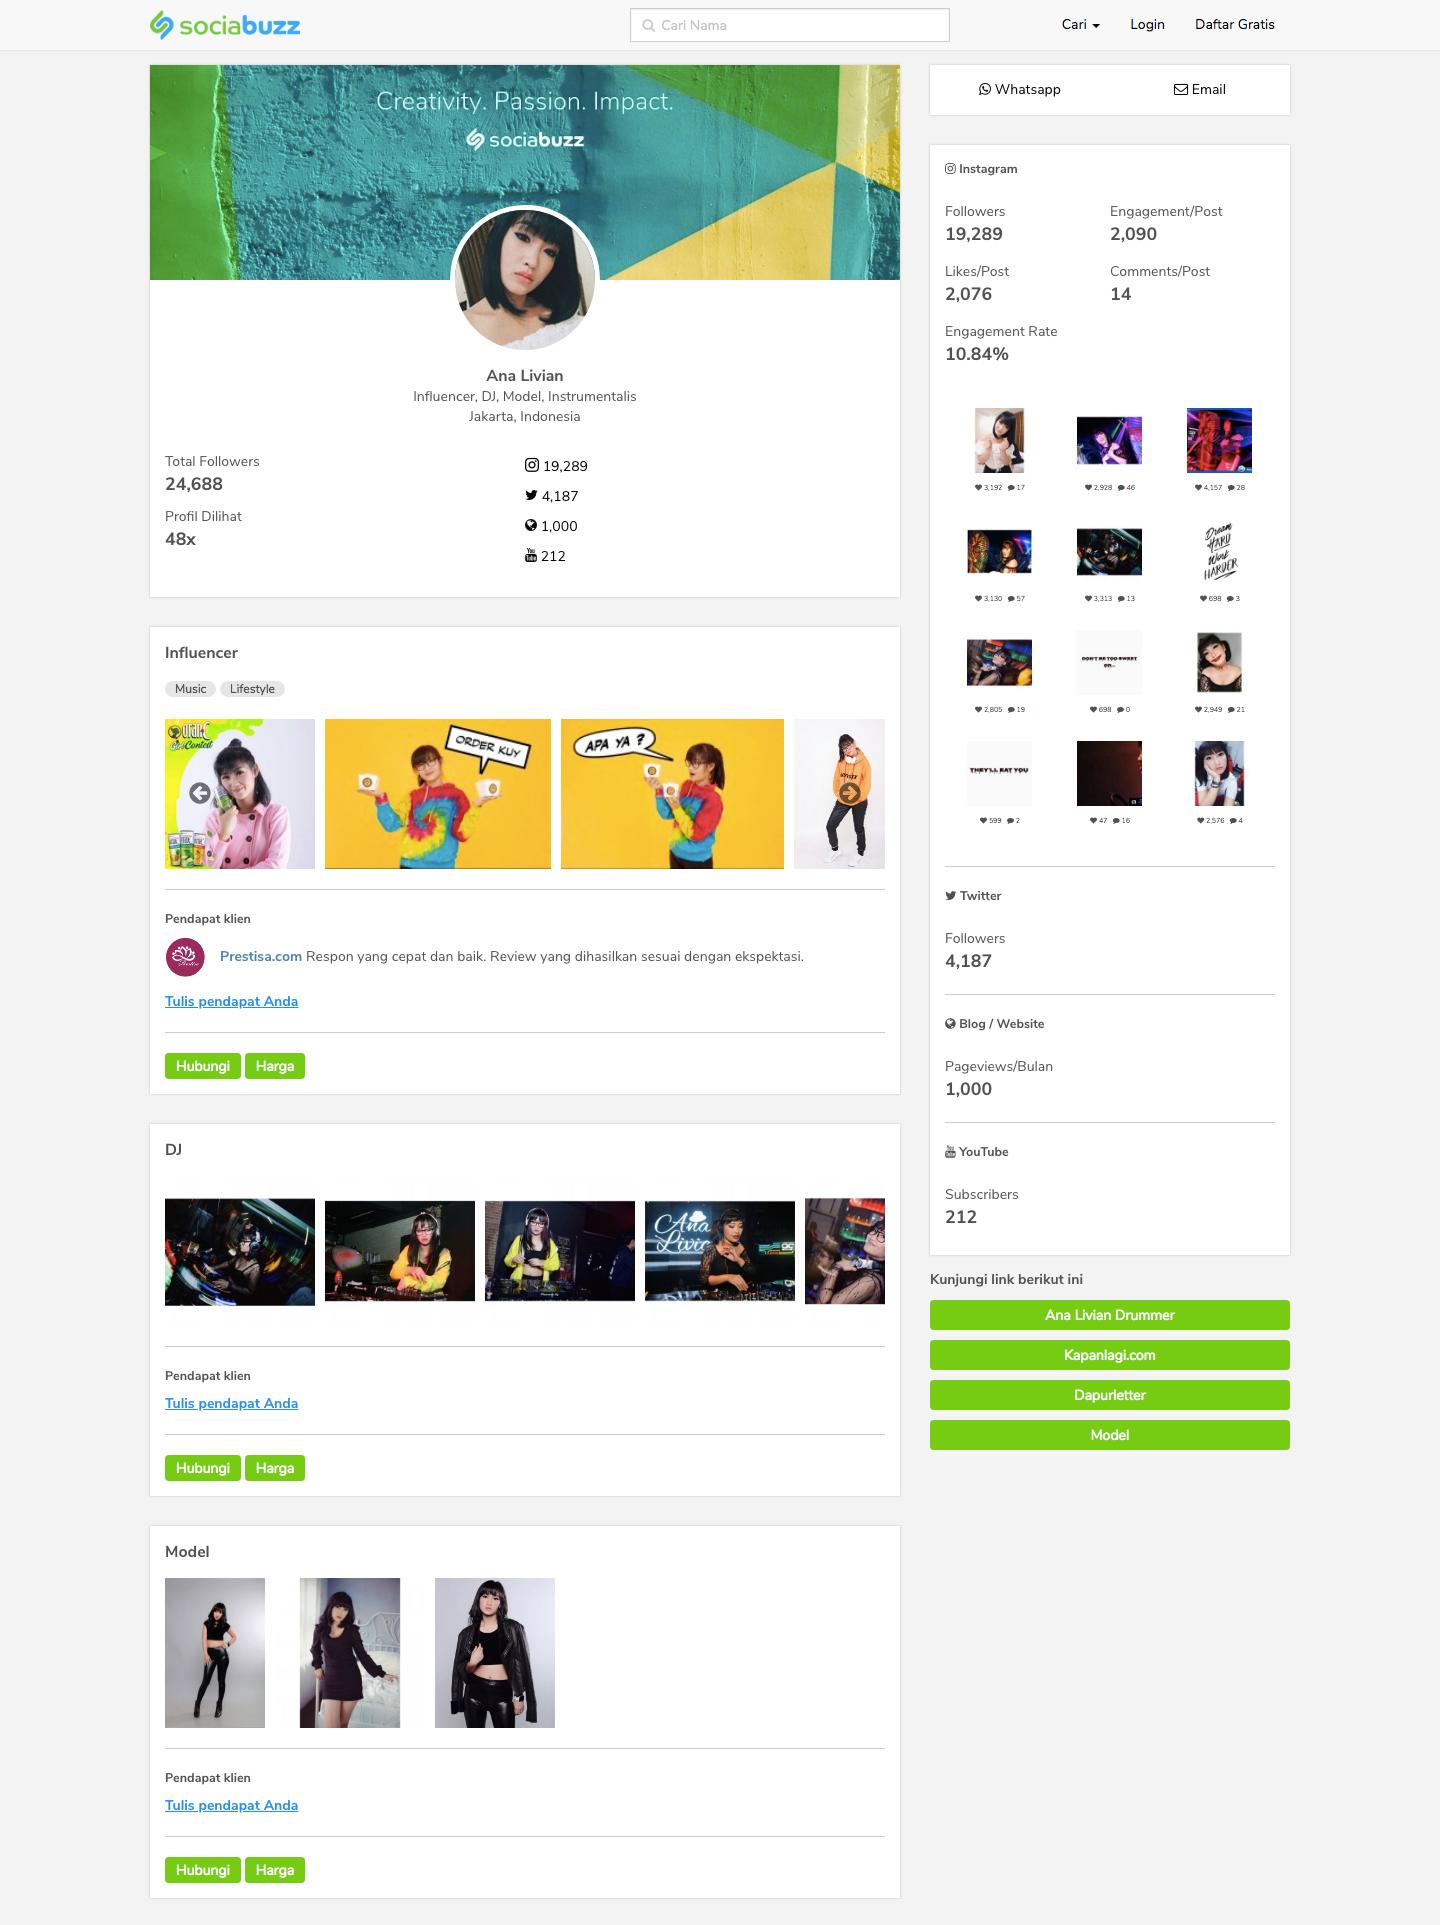 Contoh profil profesional kreatif di SociaBuzz Pro | Foto: SociaBuzz